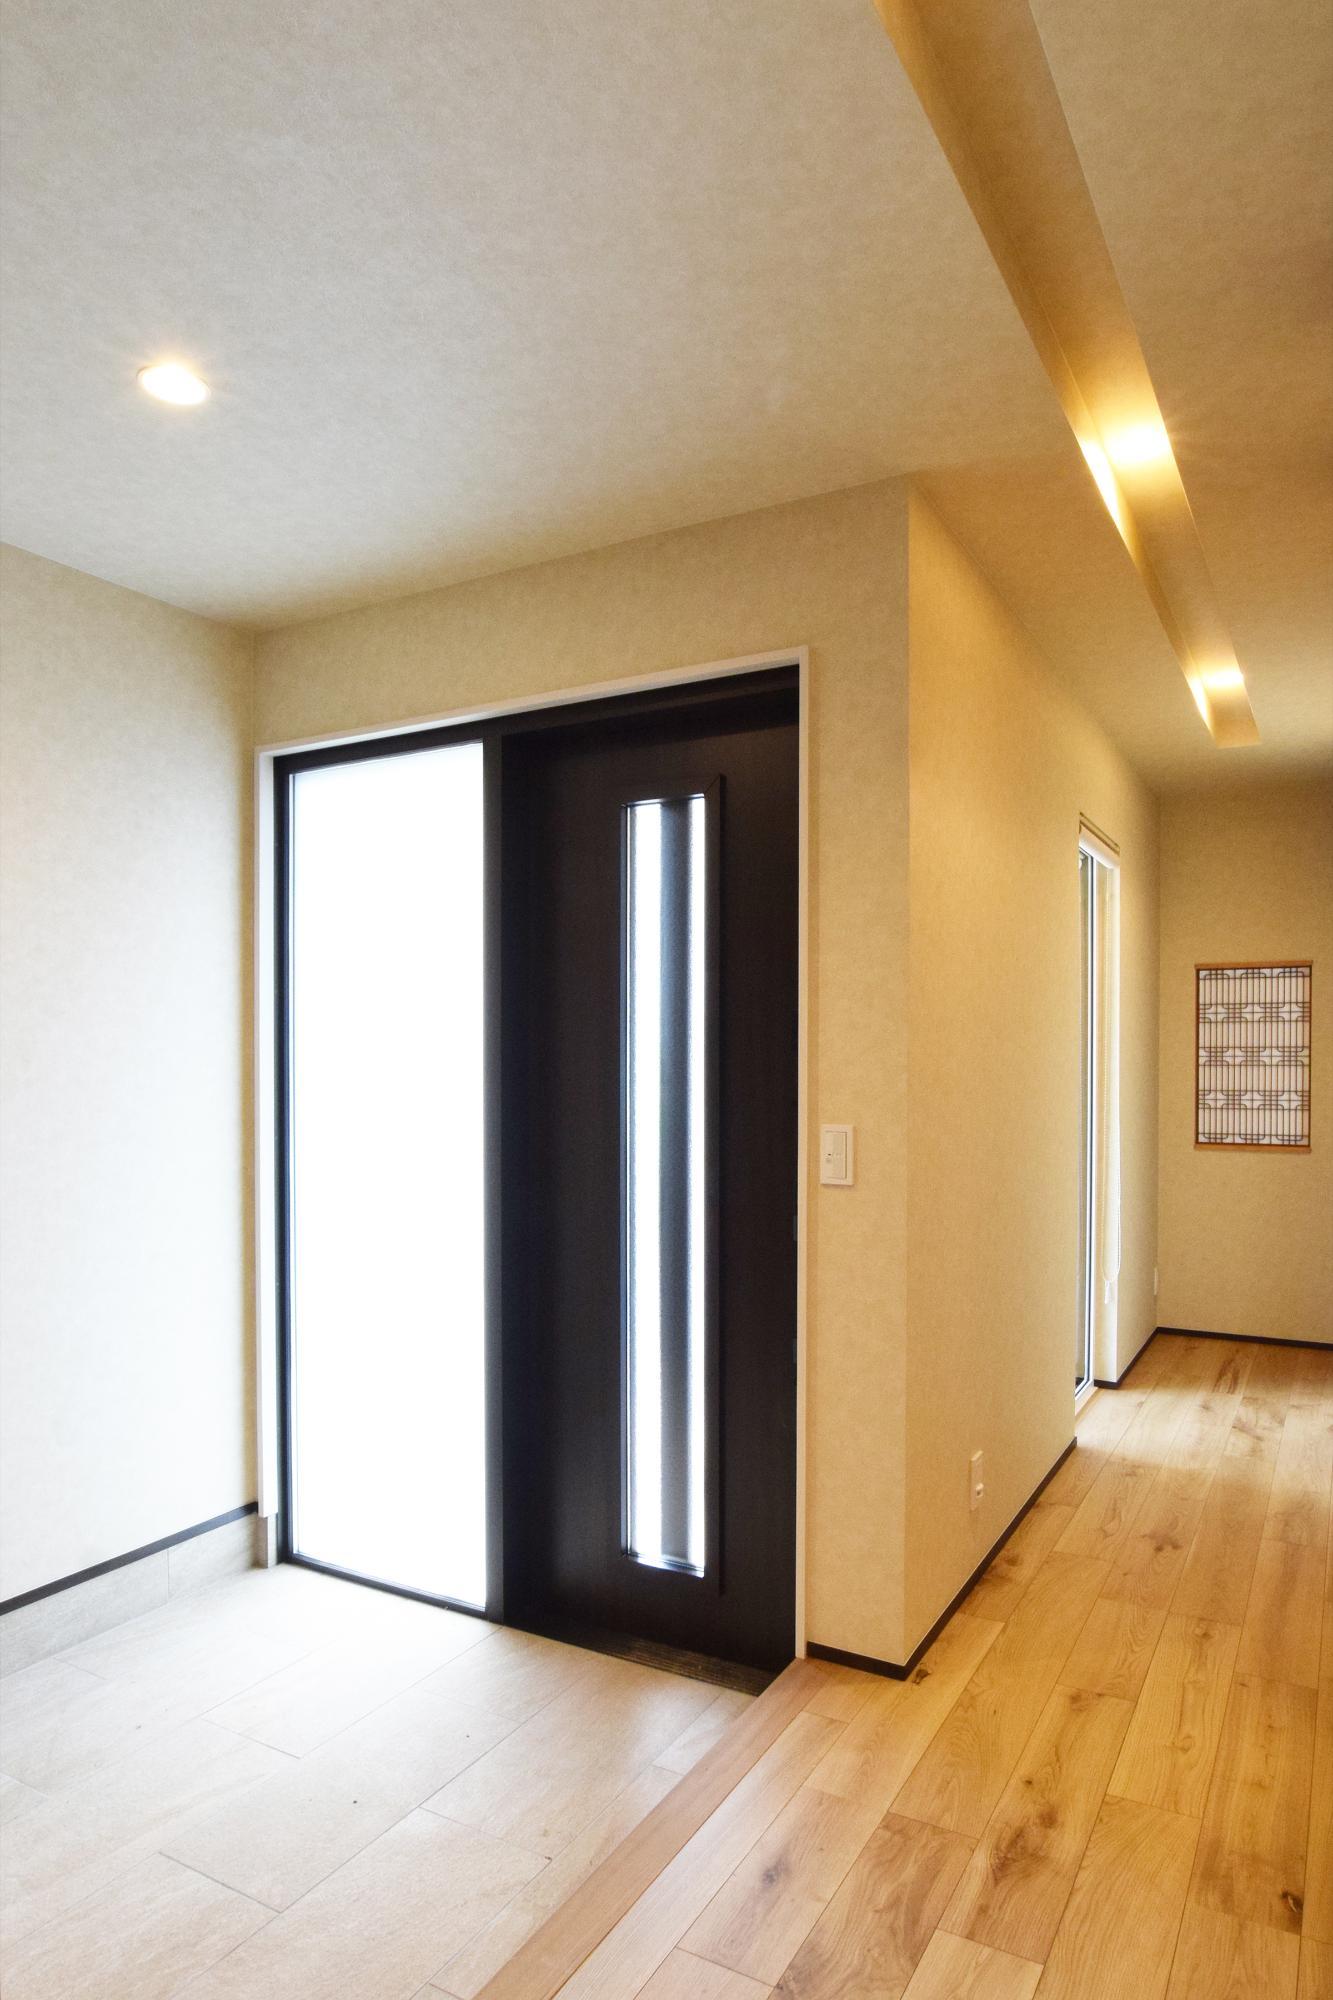 DETAIL HOME(ディテールホーム)「二世帯で住まう和モダン平屋住宅」のモダン・和風・和モダンな玄関の実例写真